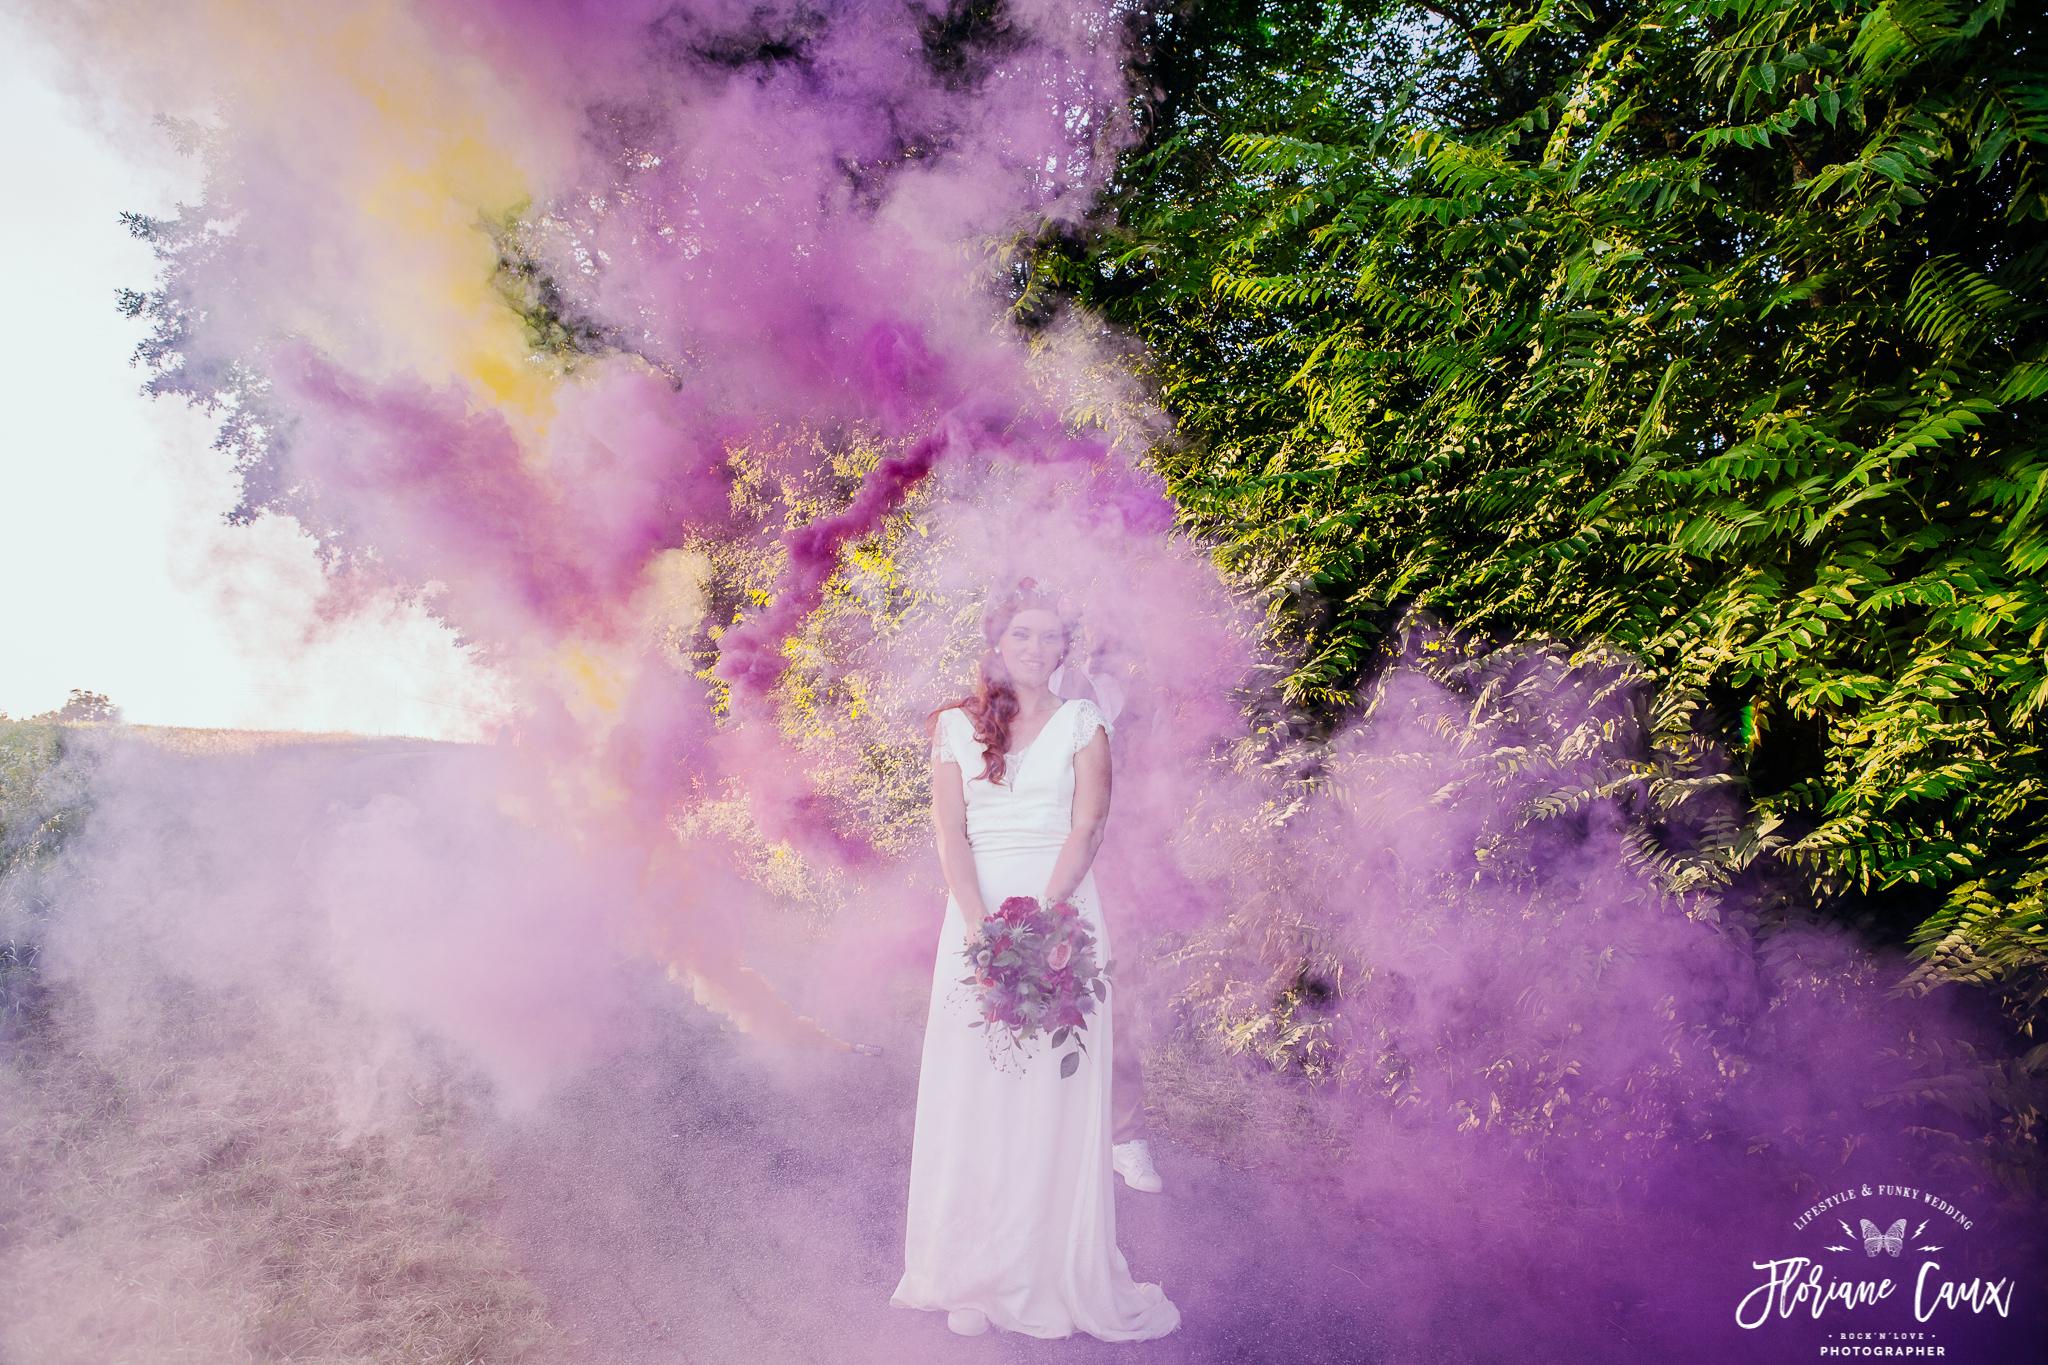 photographe-mariage-toulouse-rocknroll-maries-tatoues-floriane-caux-66